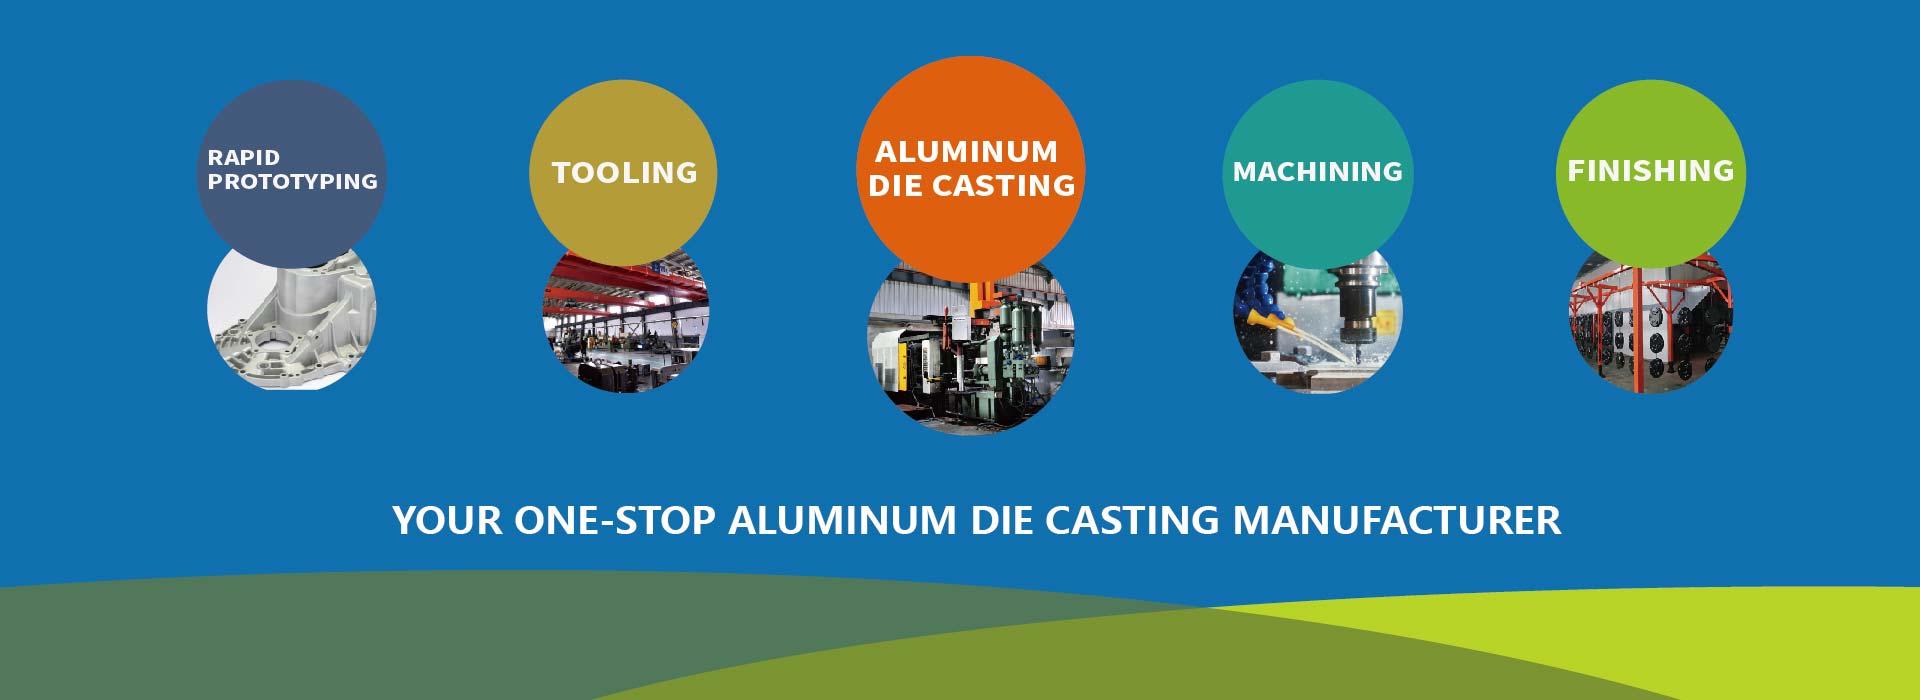 Aluminum die casting manufacturer banner-